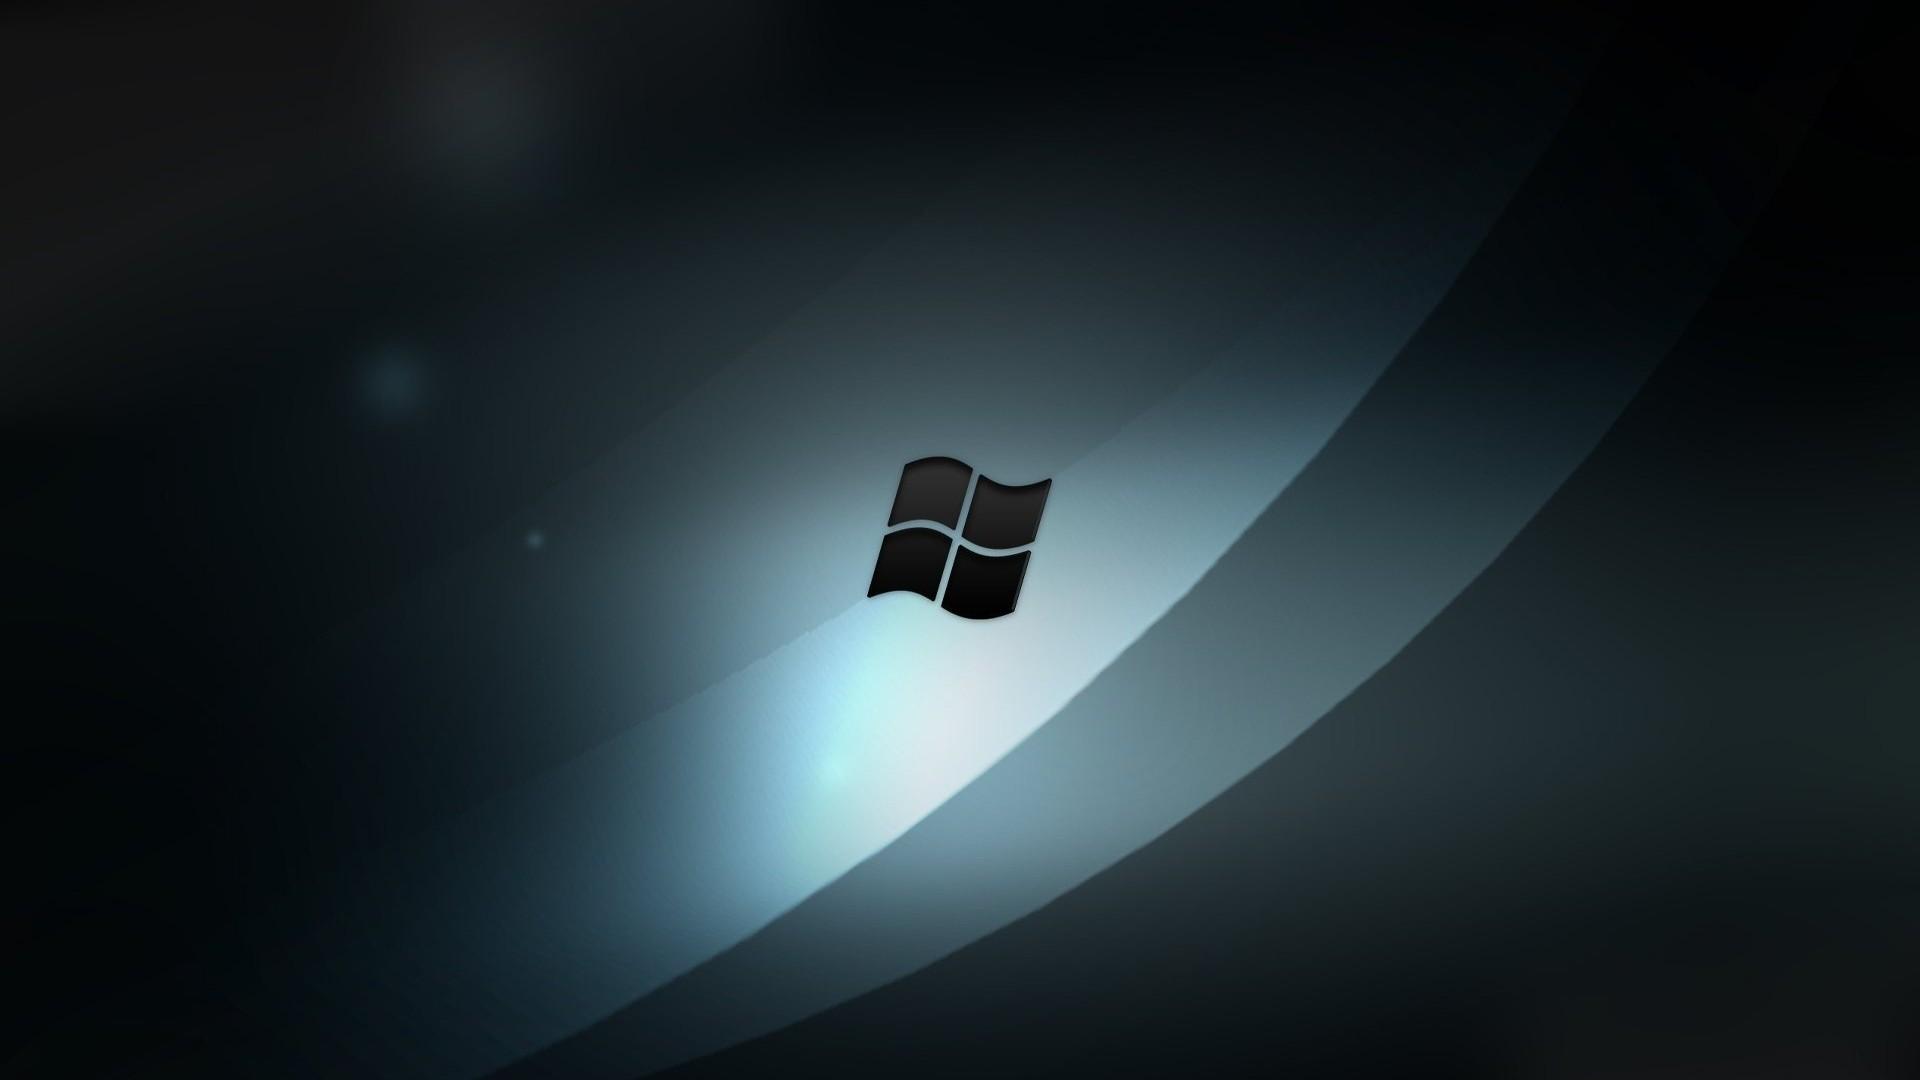 windows 7, sign, symbol